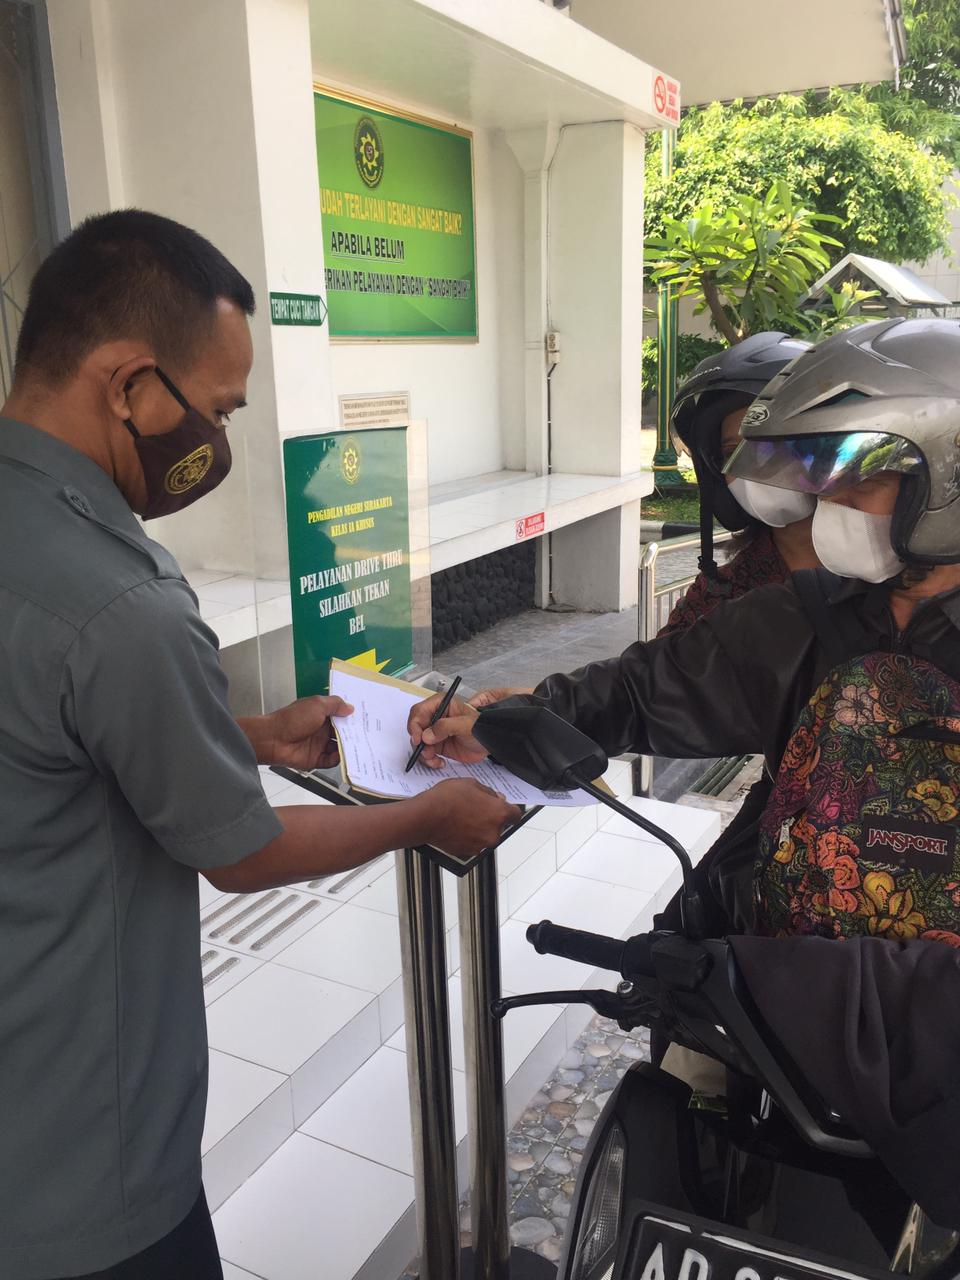 Drive Thru EraTerang (Pengambilan Surat Keterangan melalui Layanan Drive Thru) Pengadilan Negeri Surakarta,